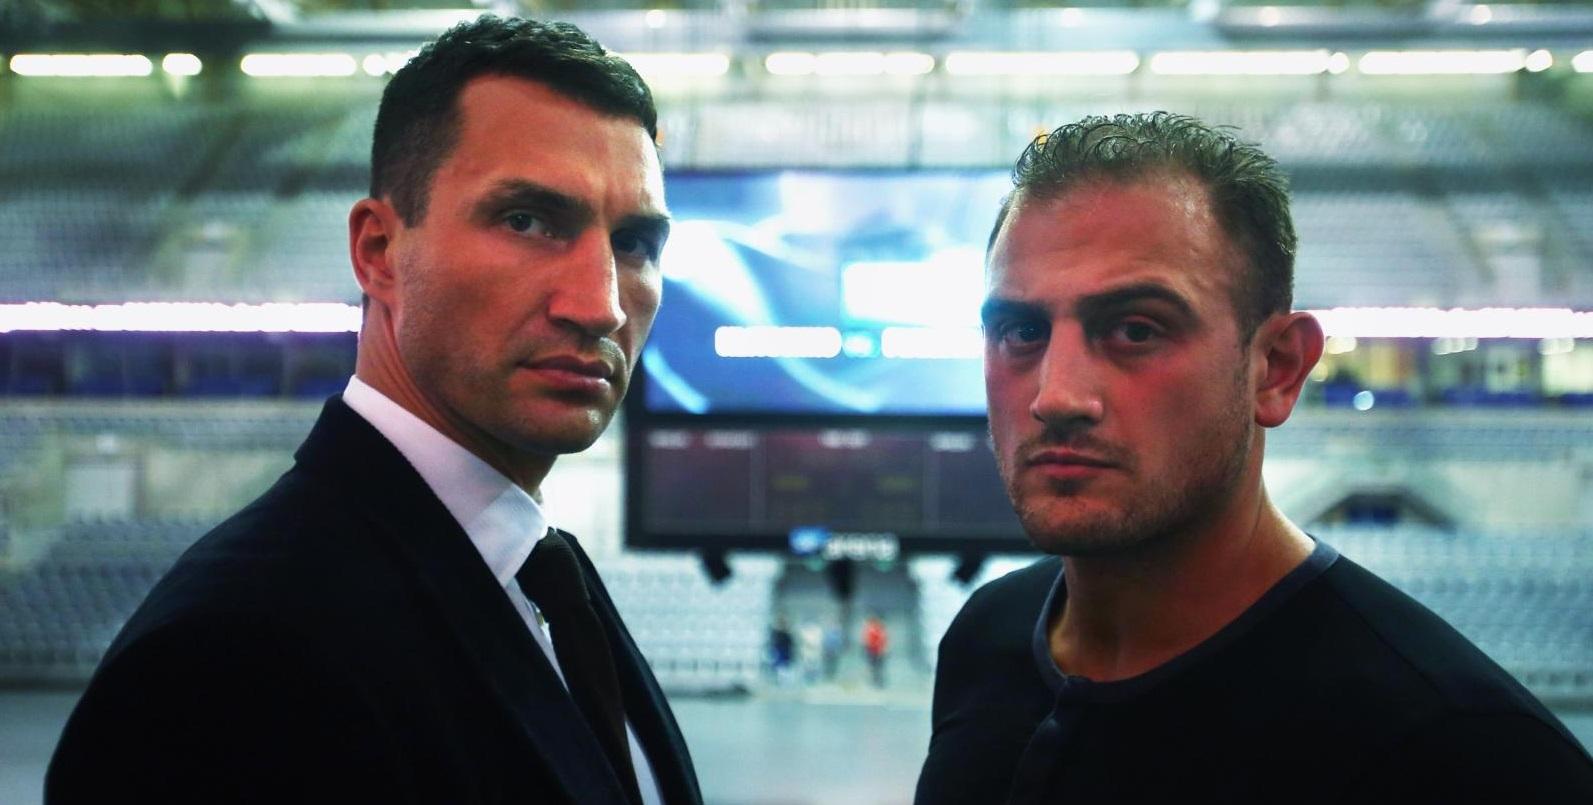 Francesco Pianeta affronta Wladimir Klitschko: il paisà sulle orme di Rocky